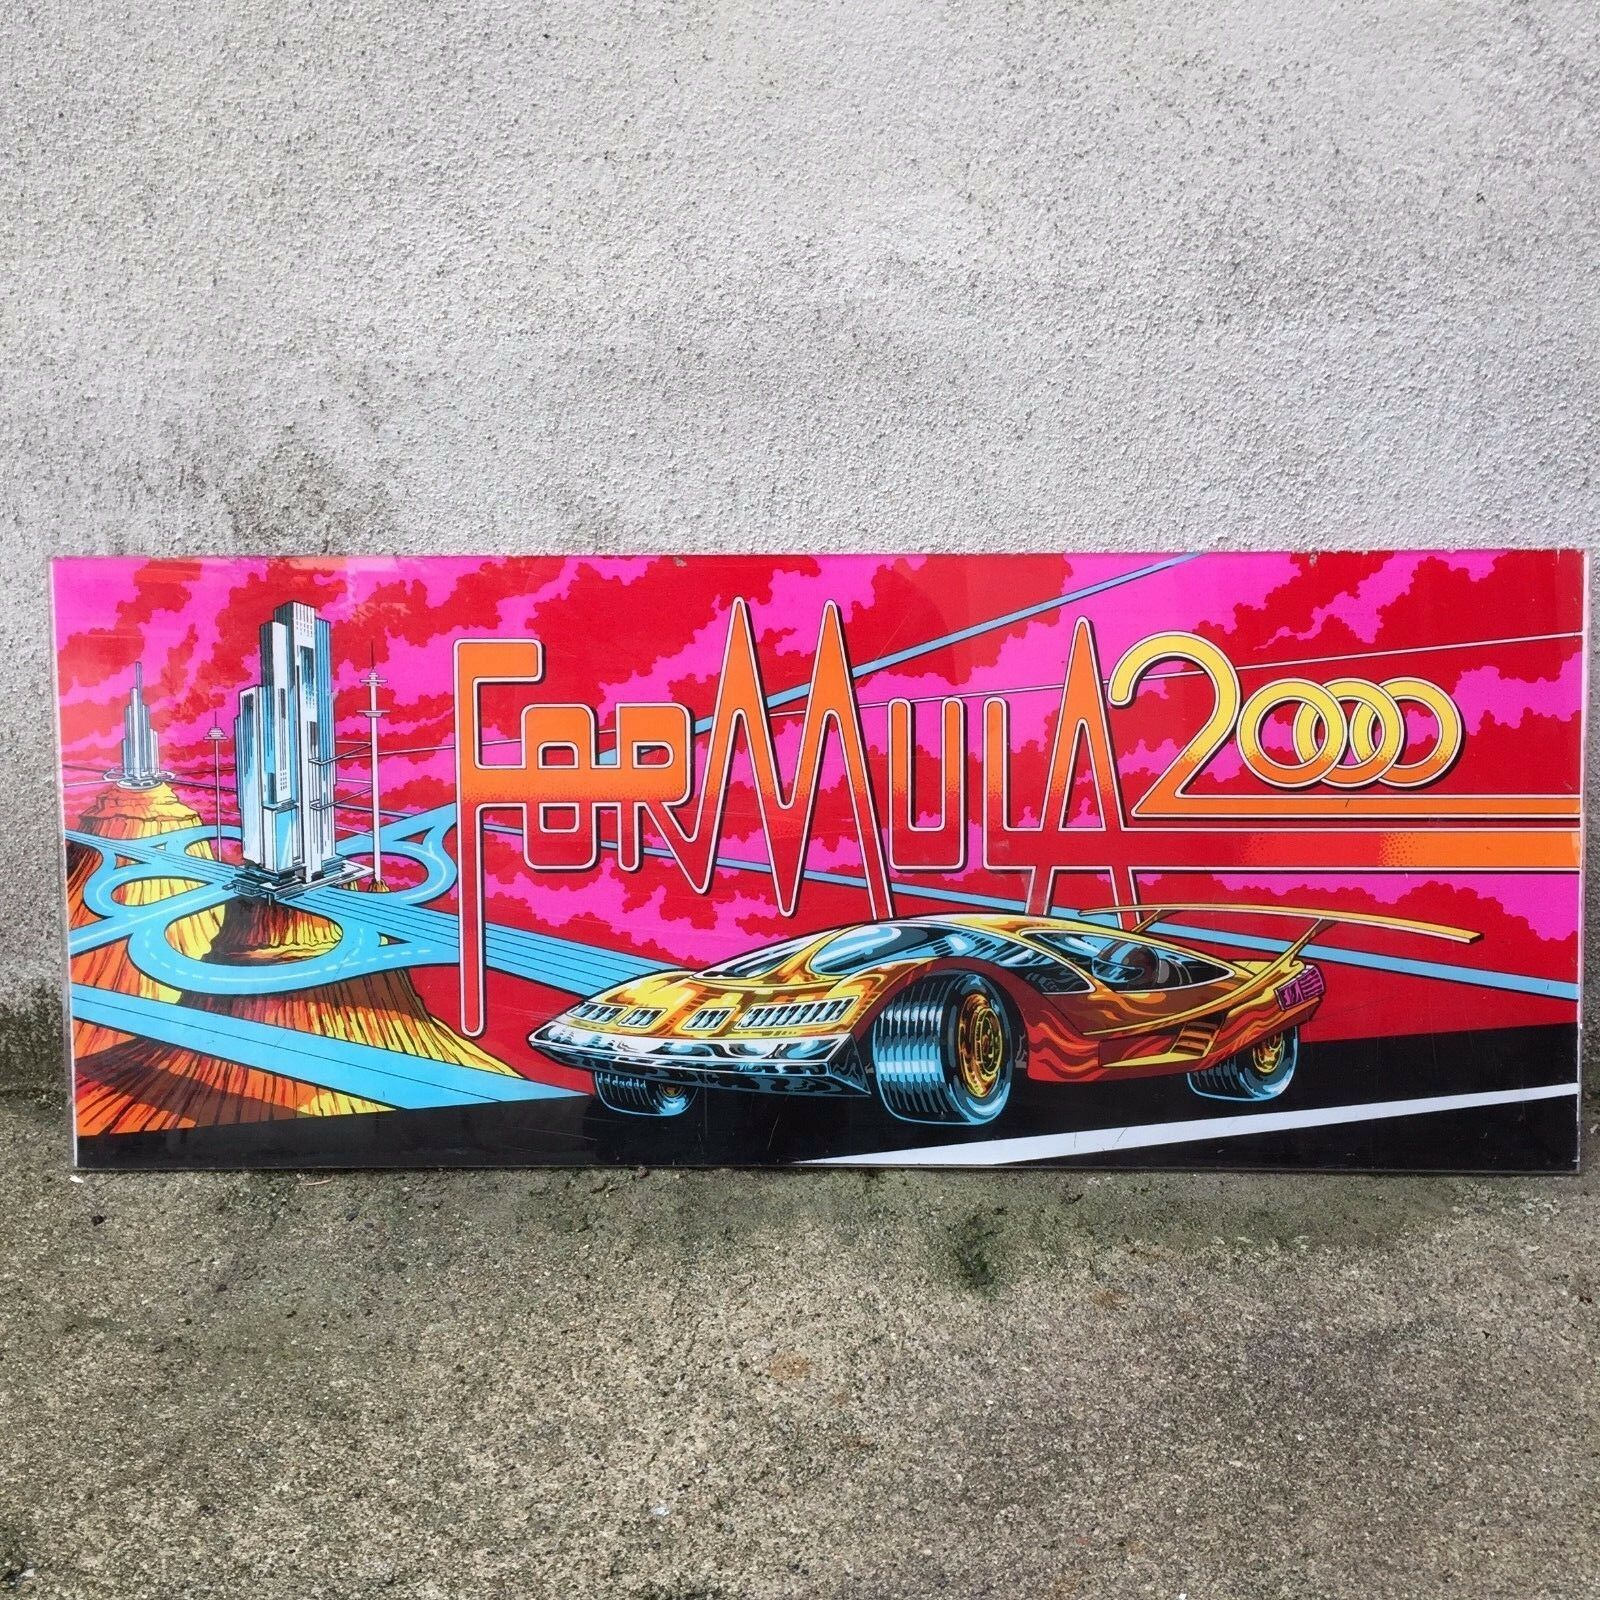 Board Arcade GAMES Formula 2000 flipper cafe deco